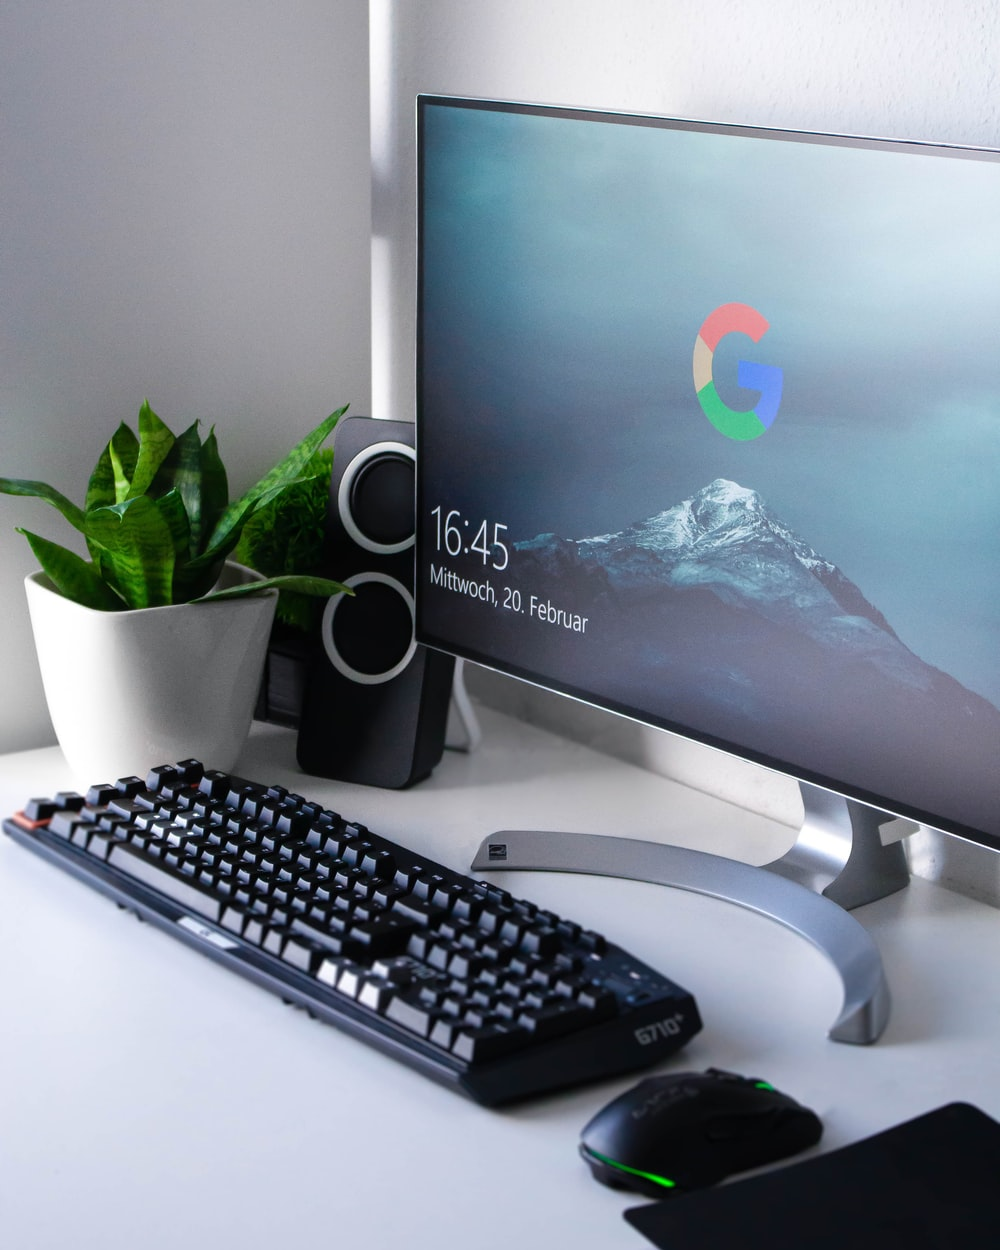 black Logitech G710+ wireless keyboard and wireless mouse near gray flat screen computer monitor on table